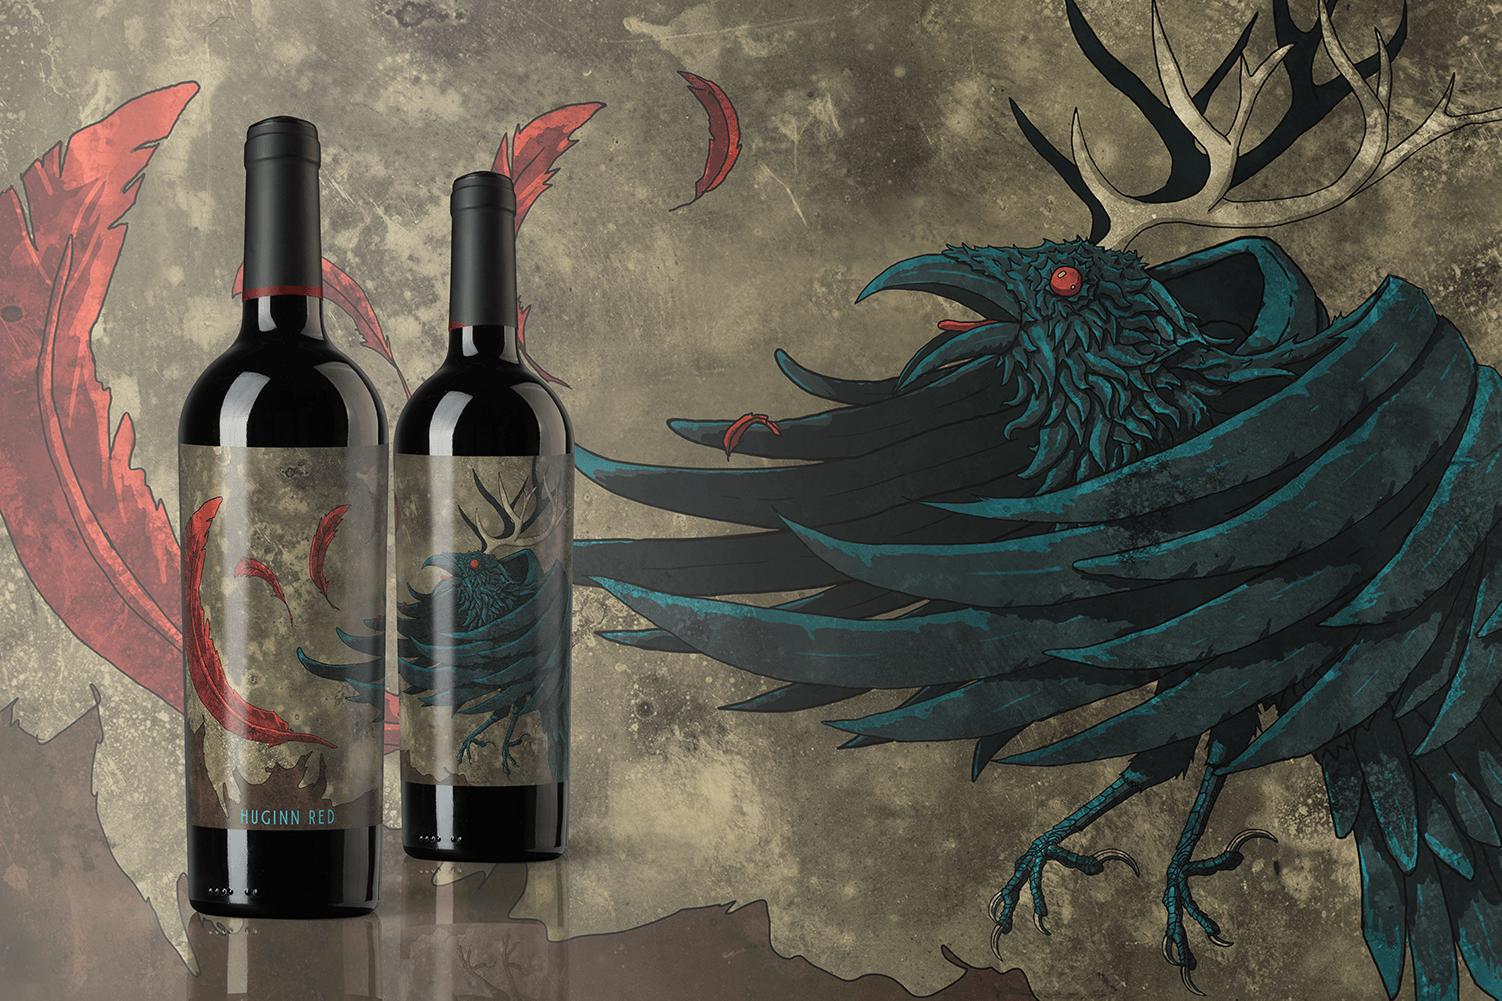 Huginn Red Wine-front-packaging-scene_mockup 4.png